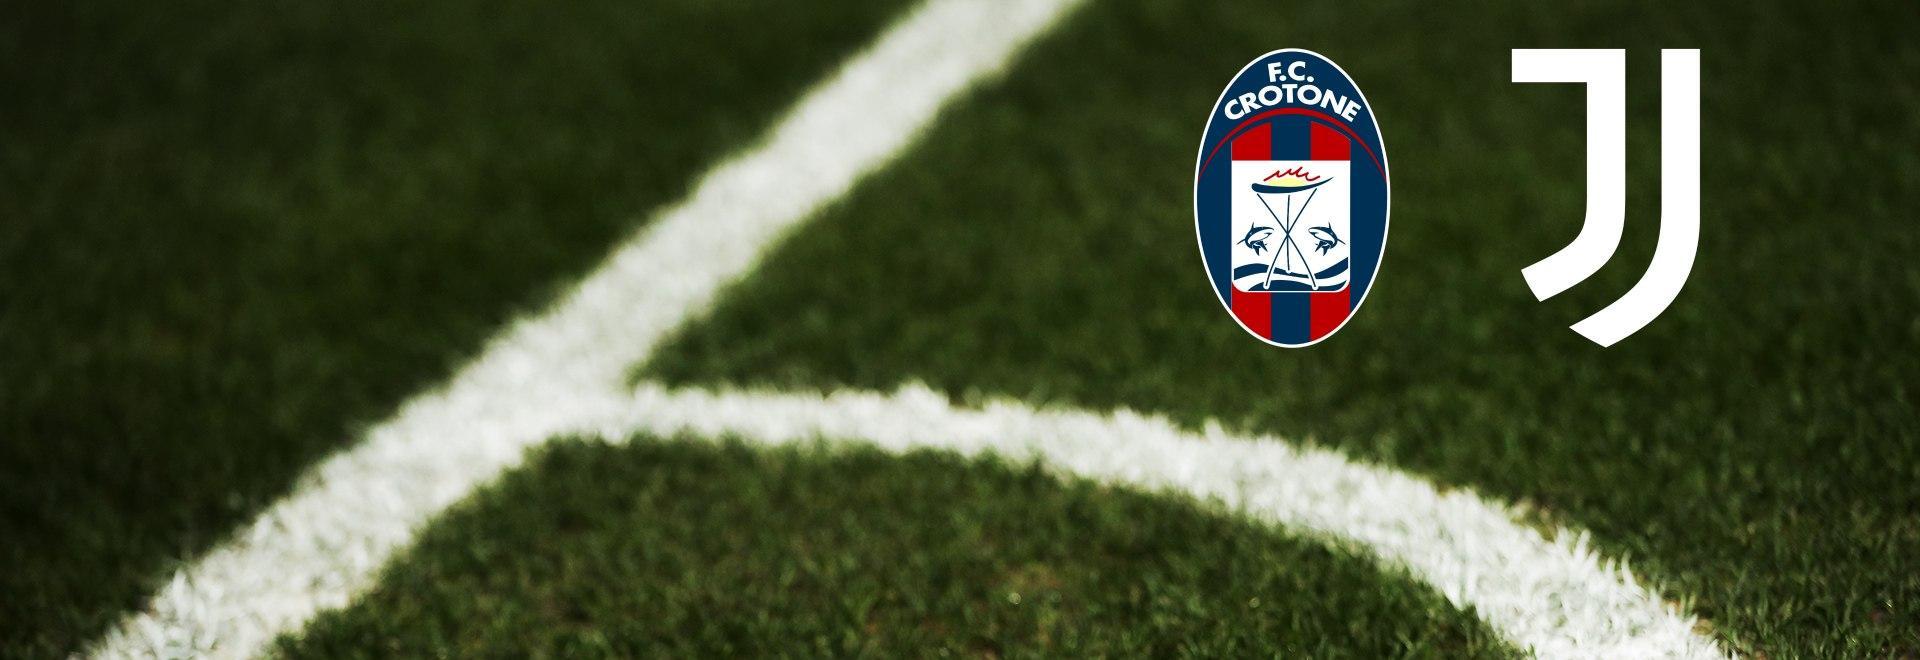 Crotone - Juventus. 4a g.